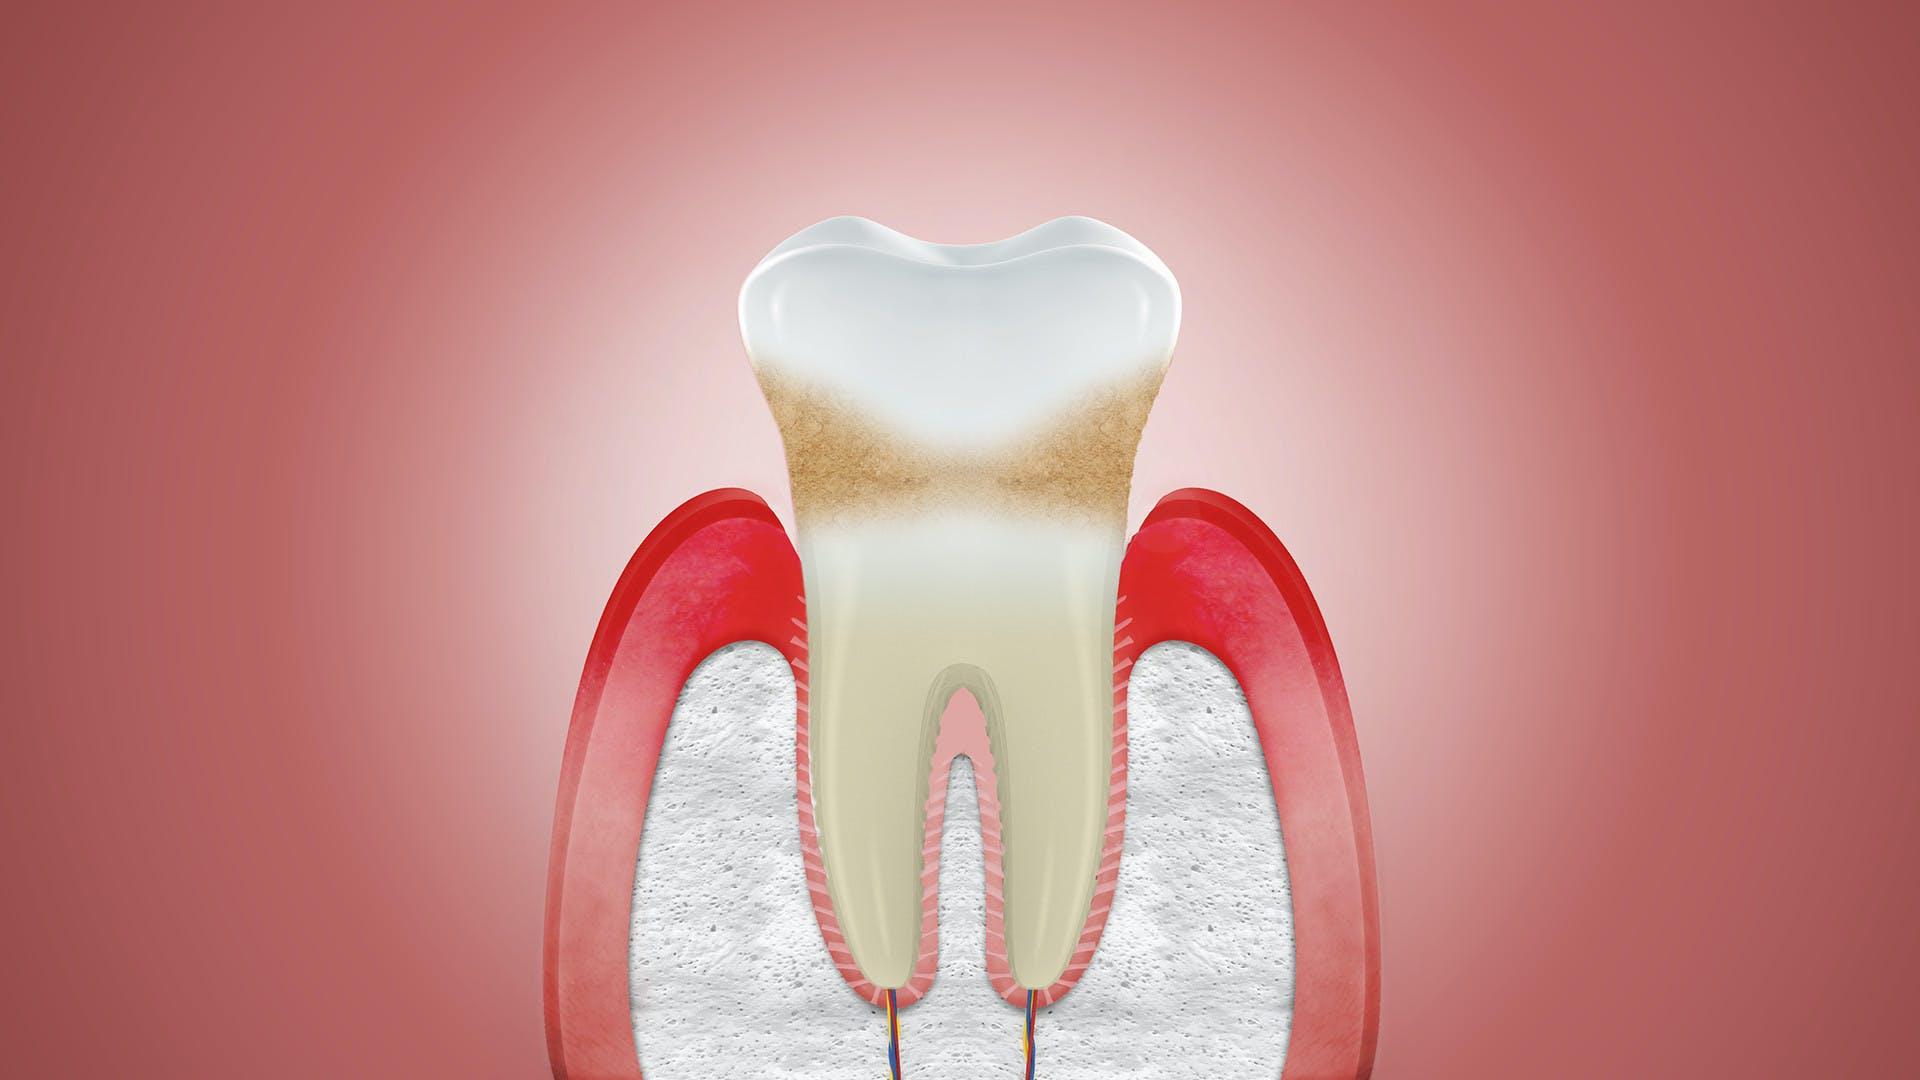 Illustration of receding gums